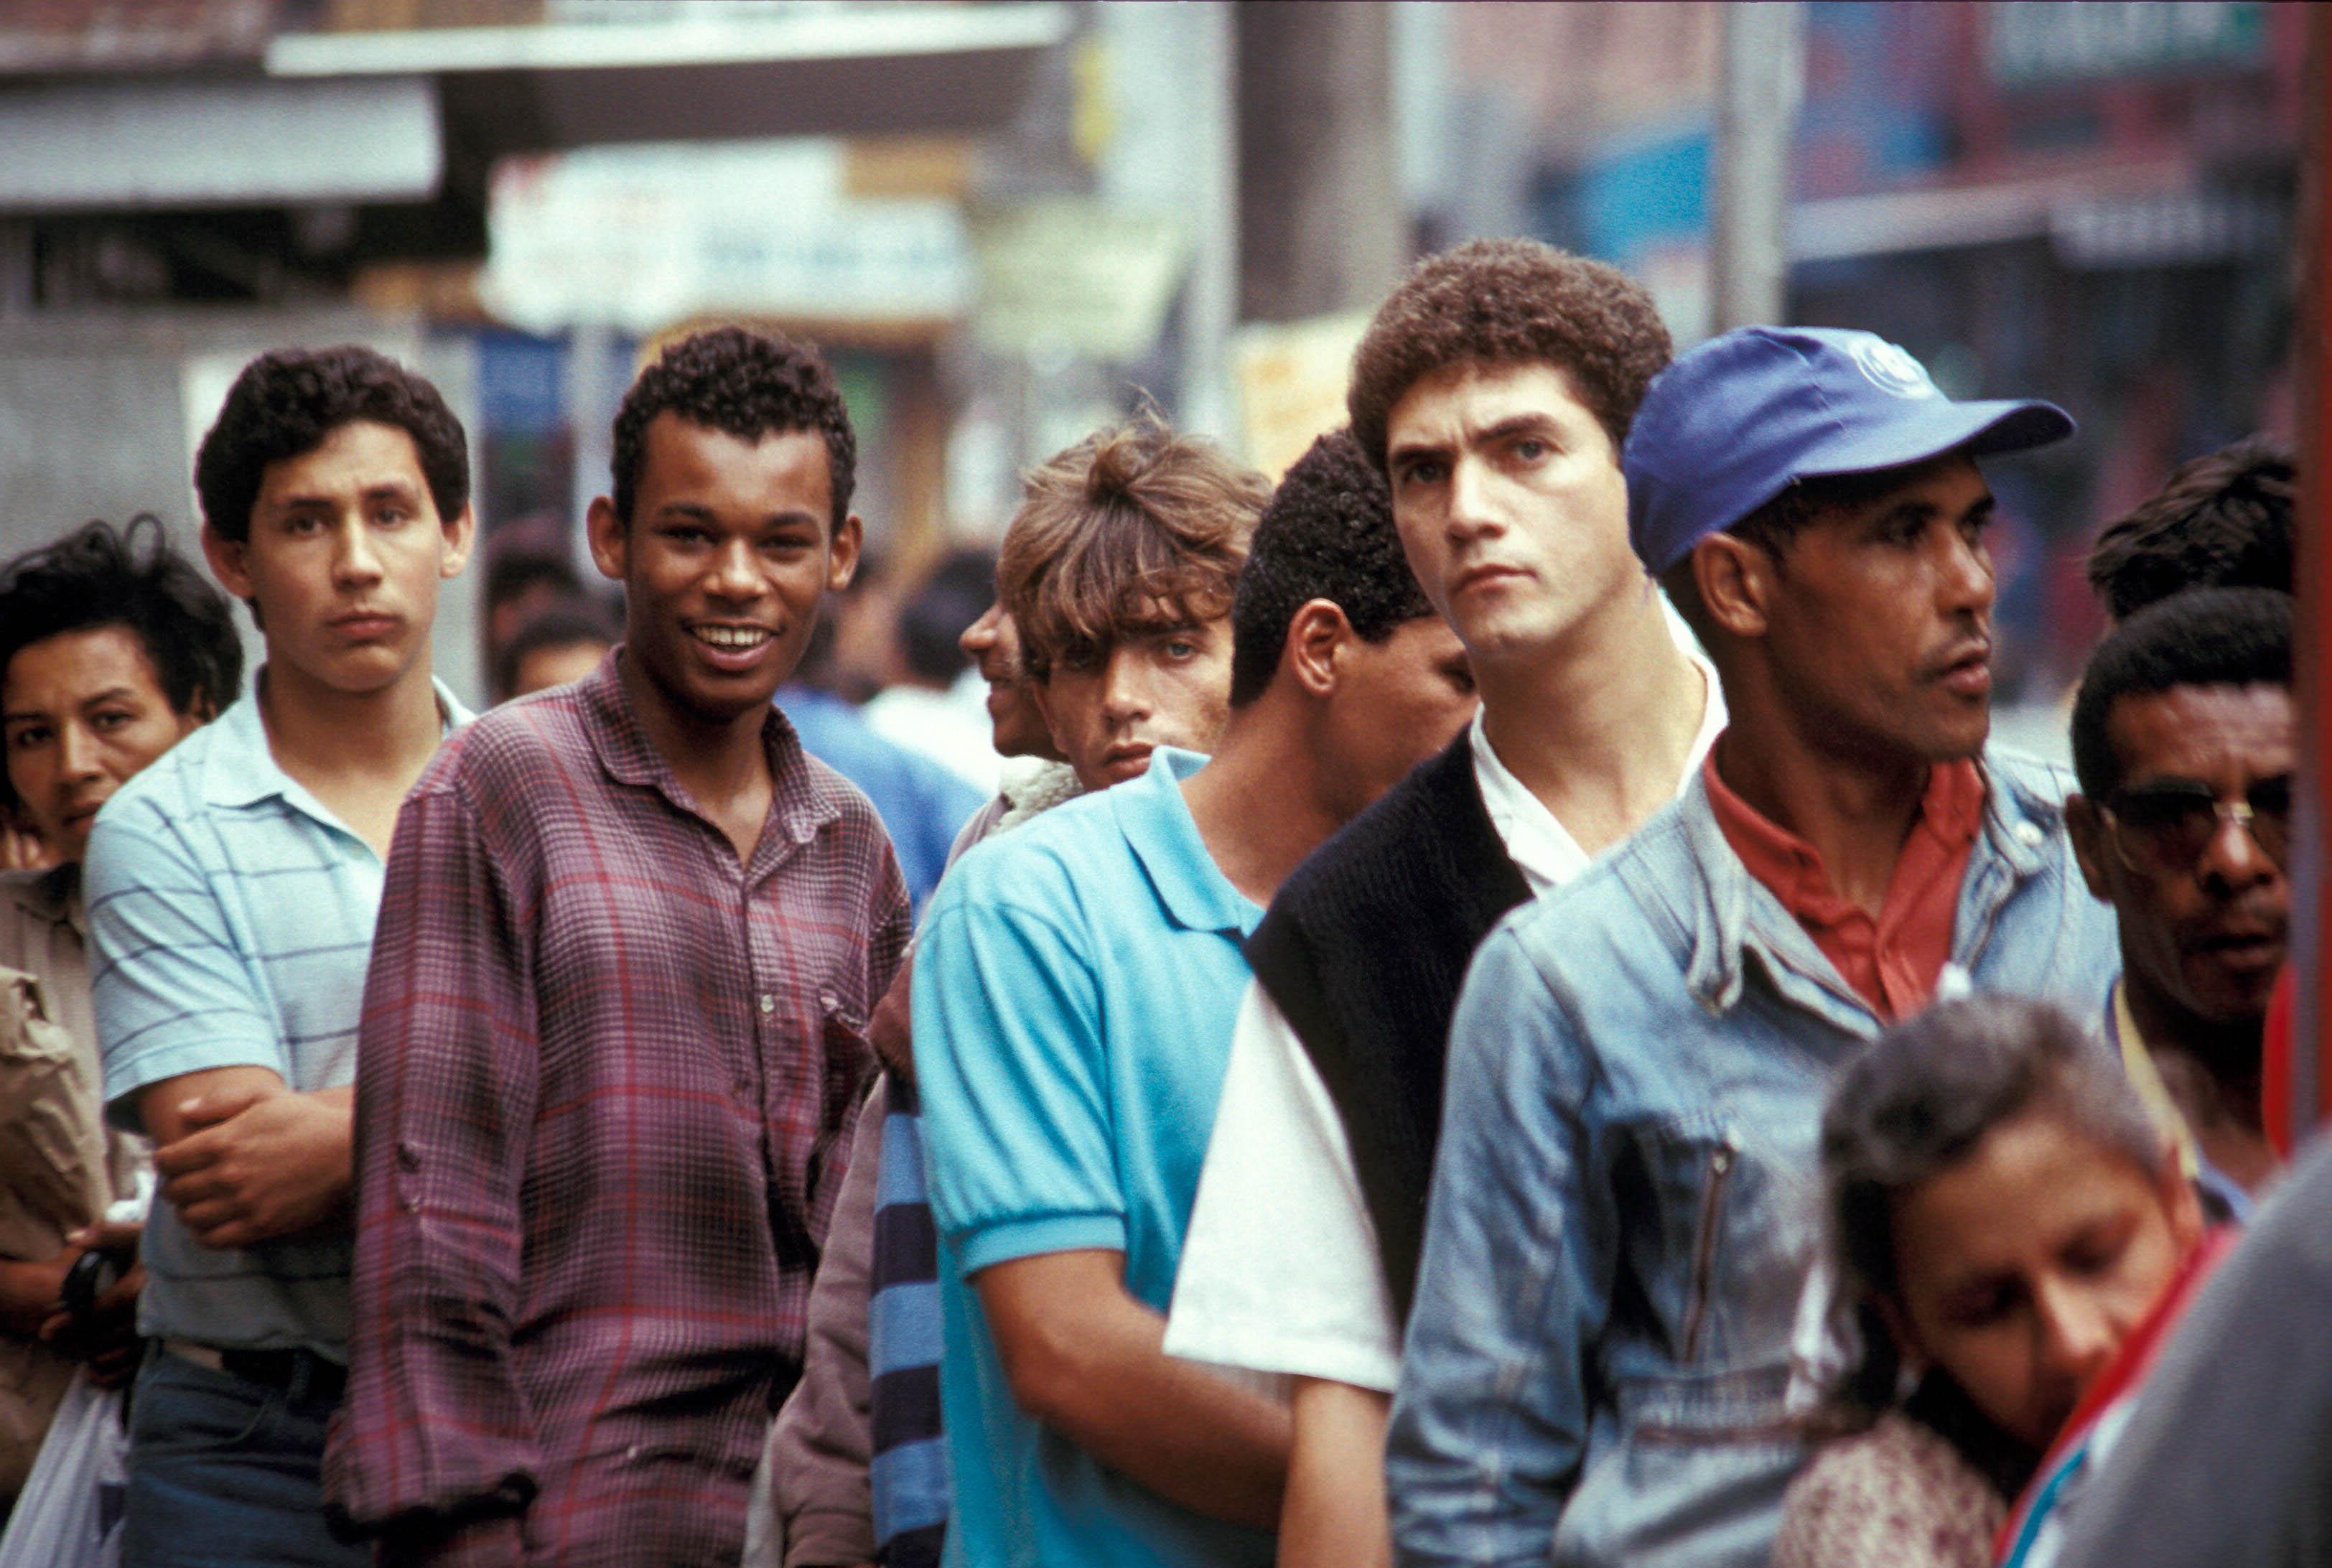 ILO warns of global employment crisis